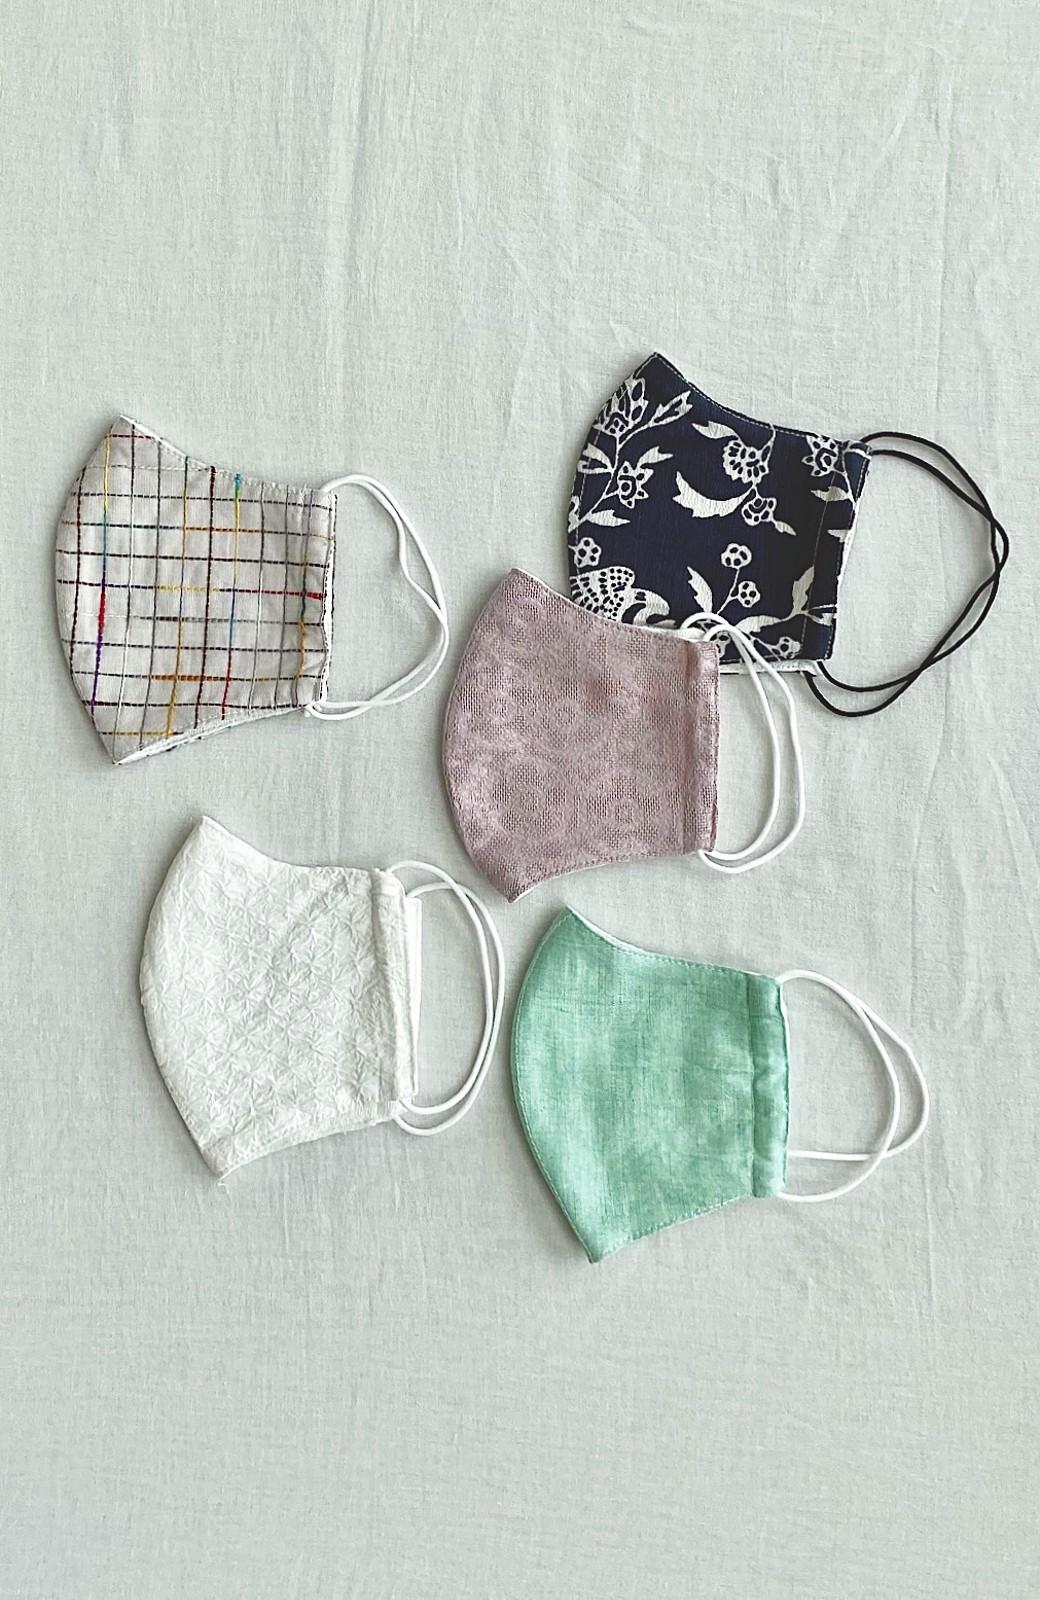 haco! ひでや工房 京都の綿ちりめん浴衣 <カラフル>の商品写真19